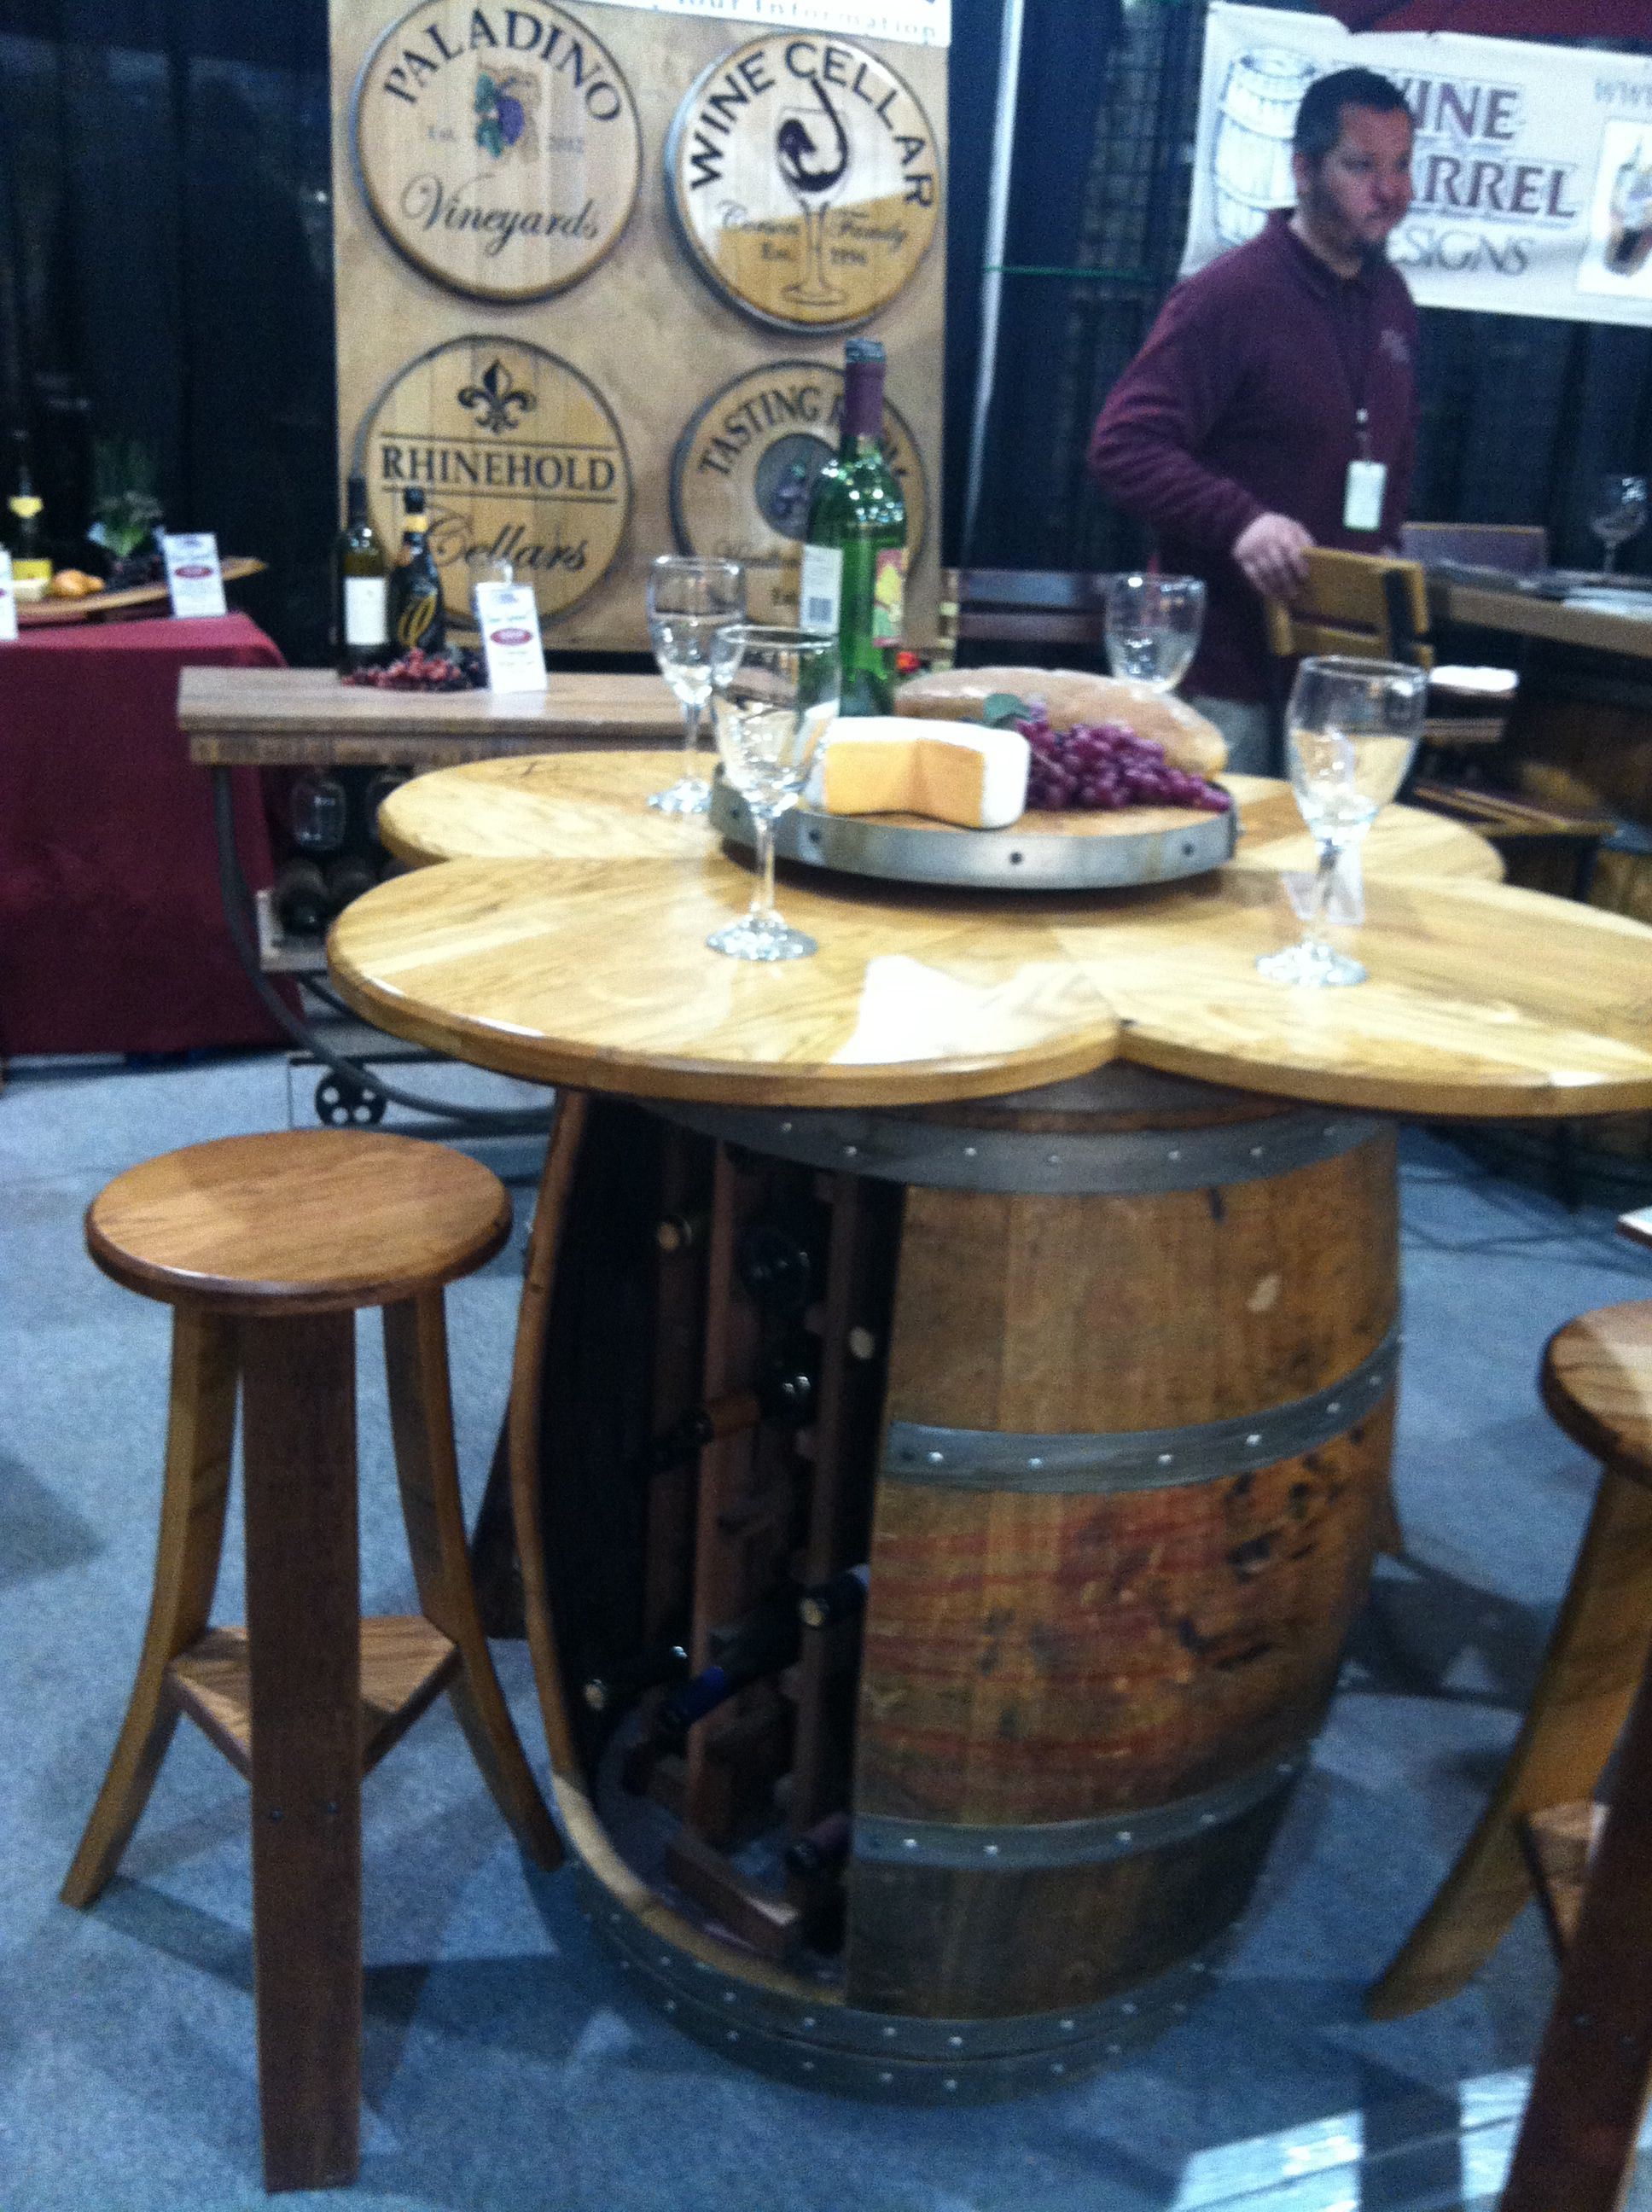 wine barrel ideas wine barrel outdoor wine barrel table decorating ideas worth making note of pinterest cafe lighting 16400 natural linen